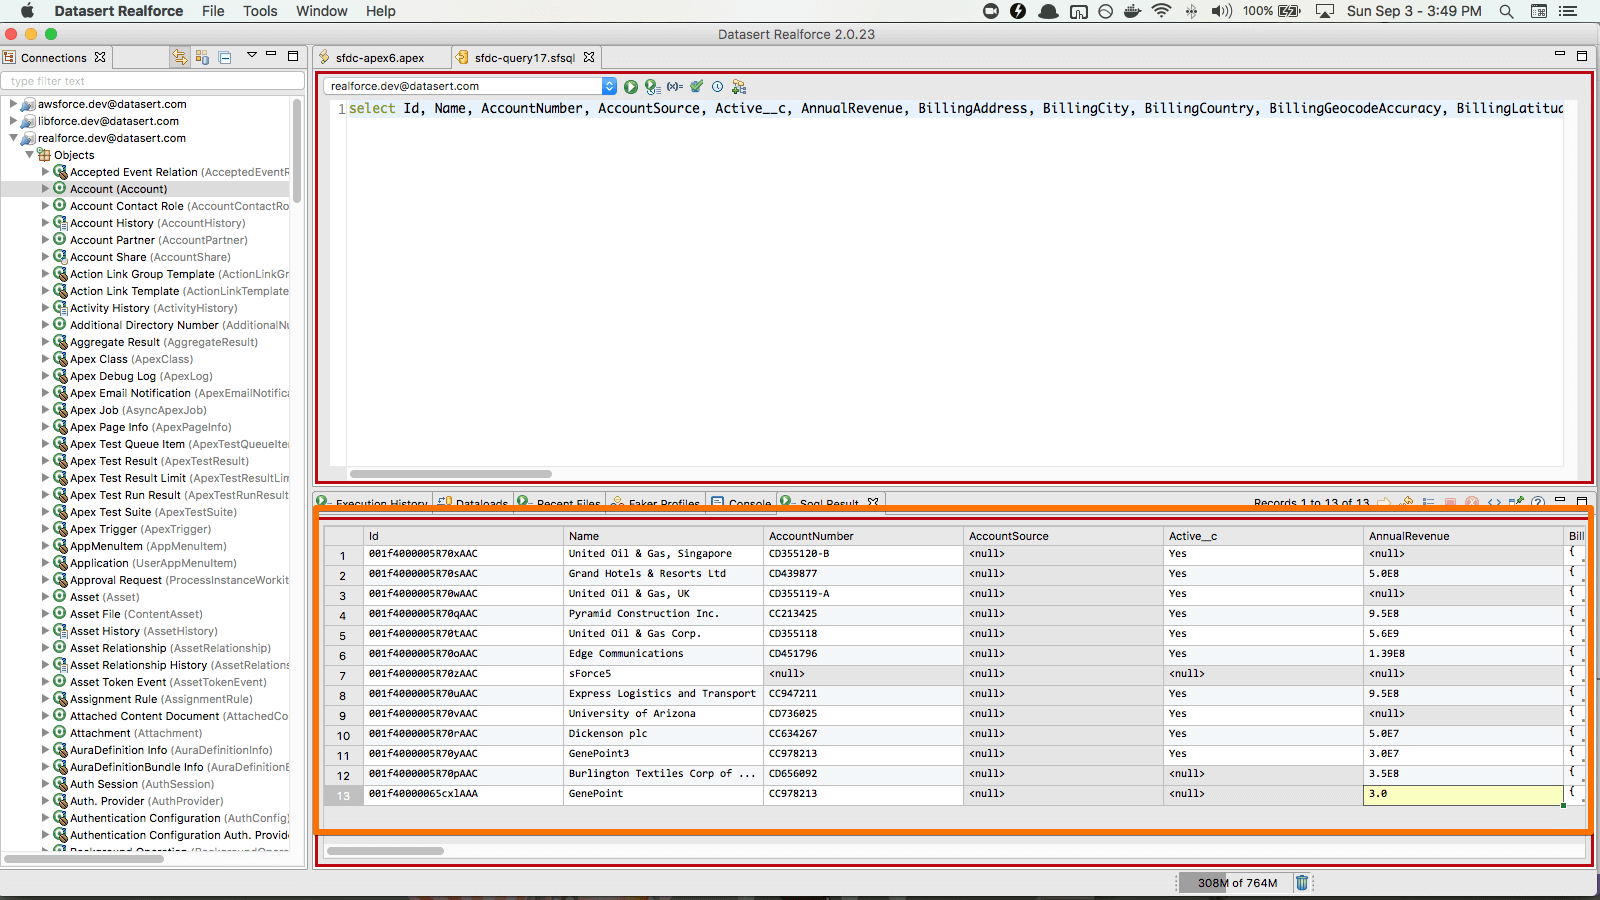 Datasert - Realfire